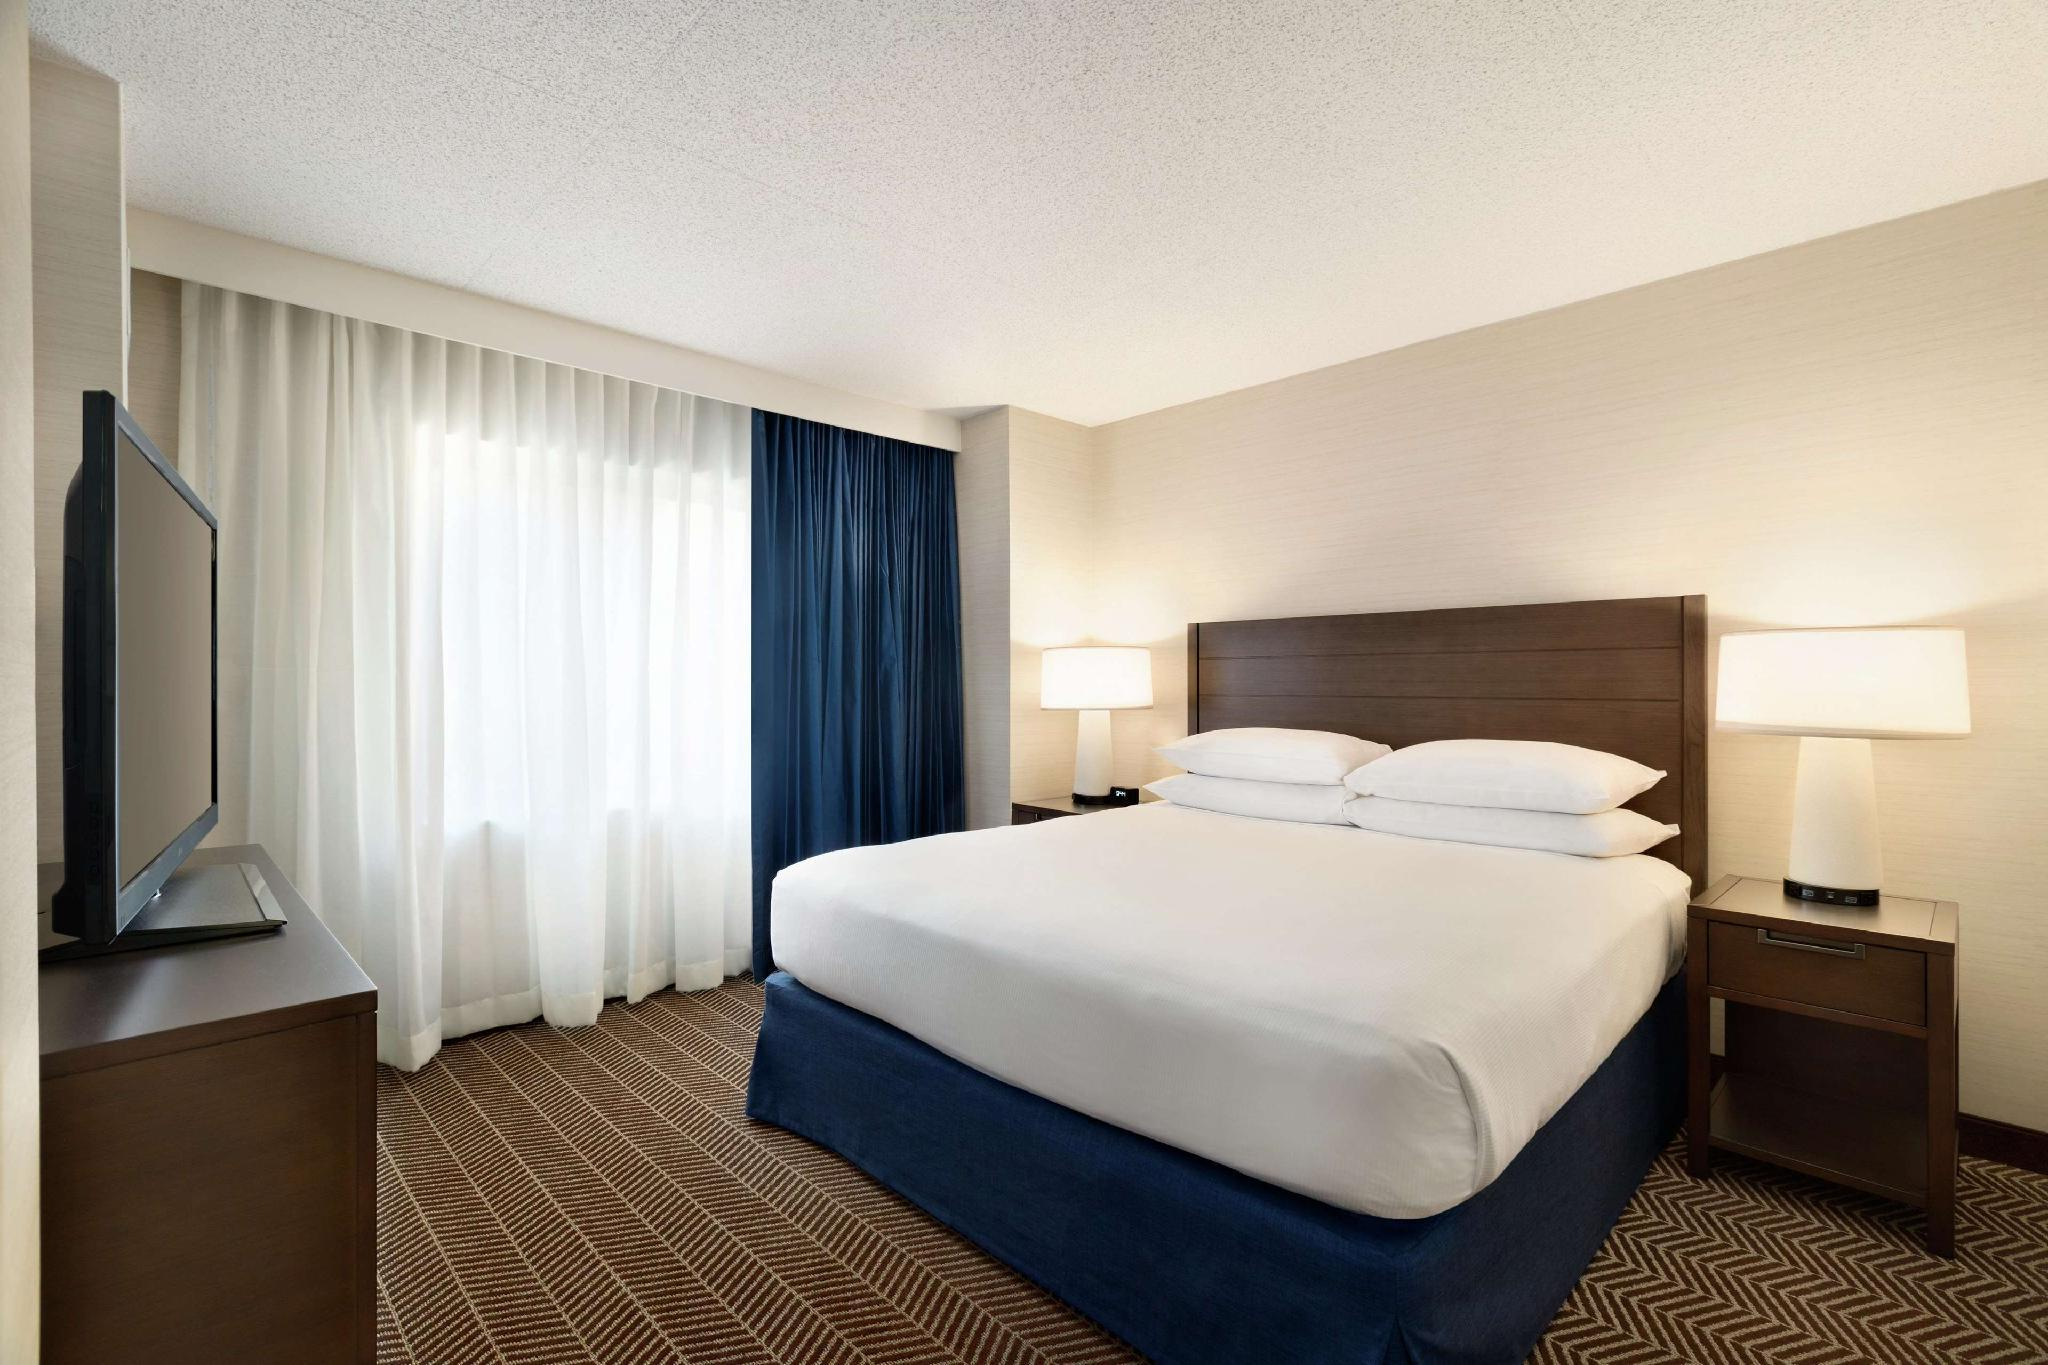 Beter Bed Slaapbank Driver.Embassy Suites Hotel Boston Logan Airport Boston Ma Boek Een